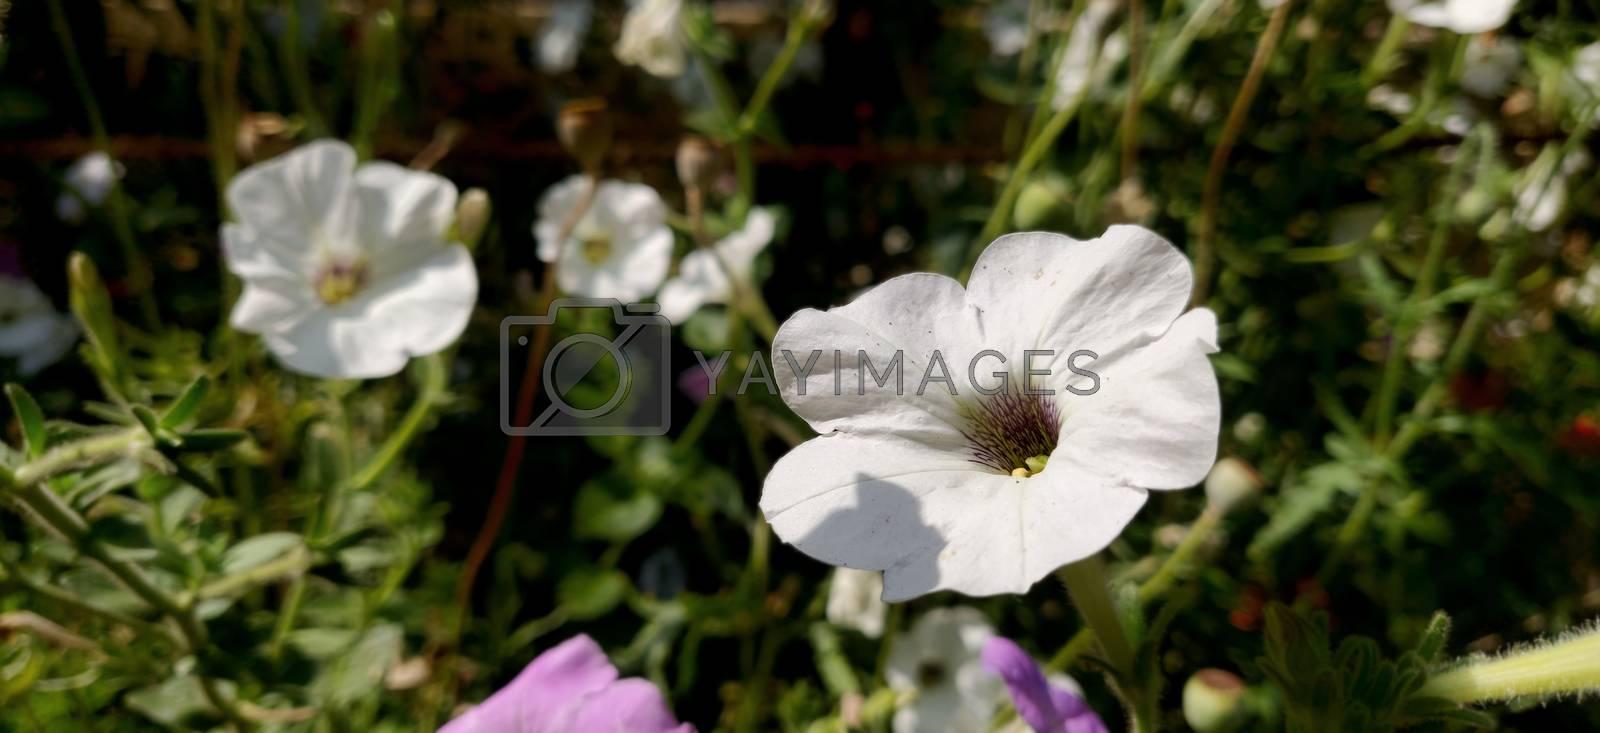 White flower in sunlight in the summer season in India